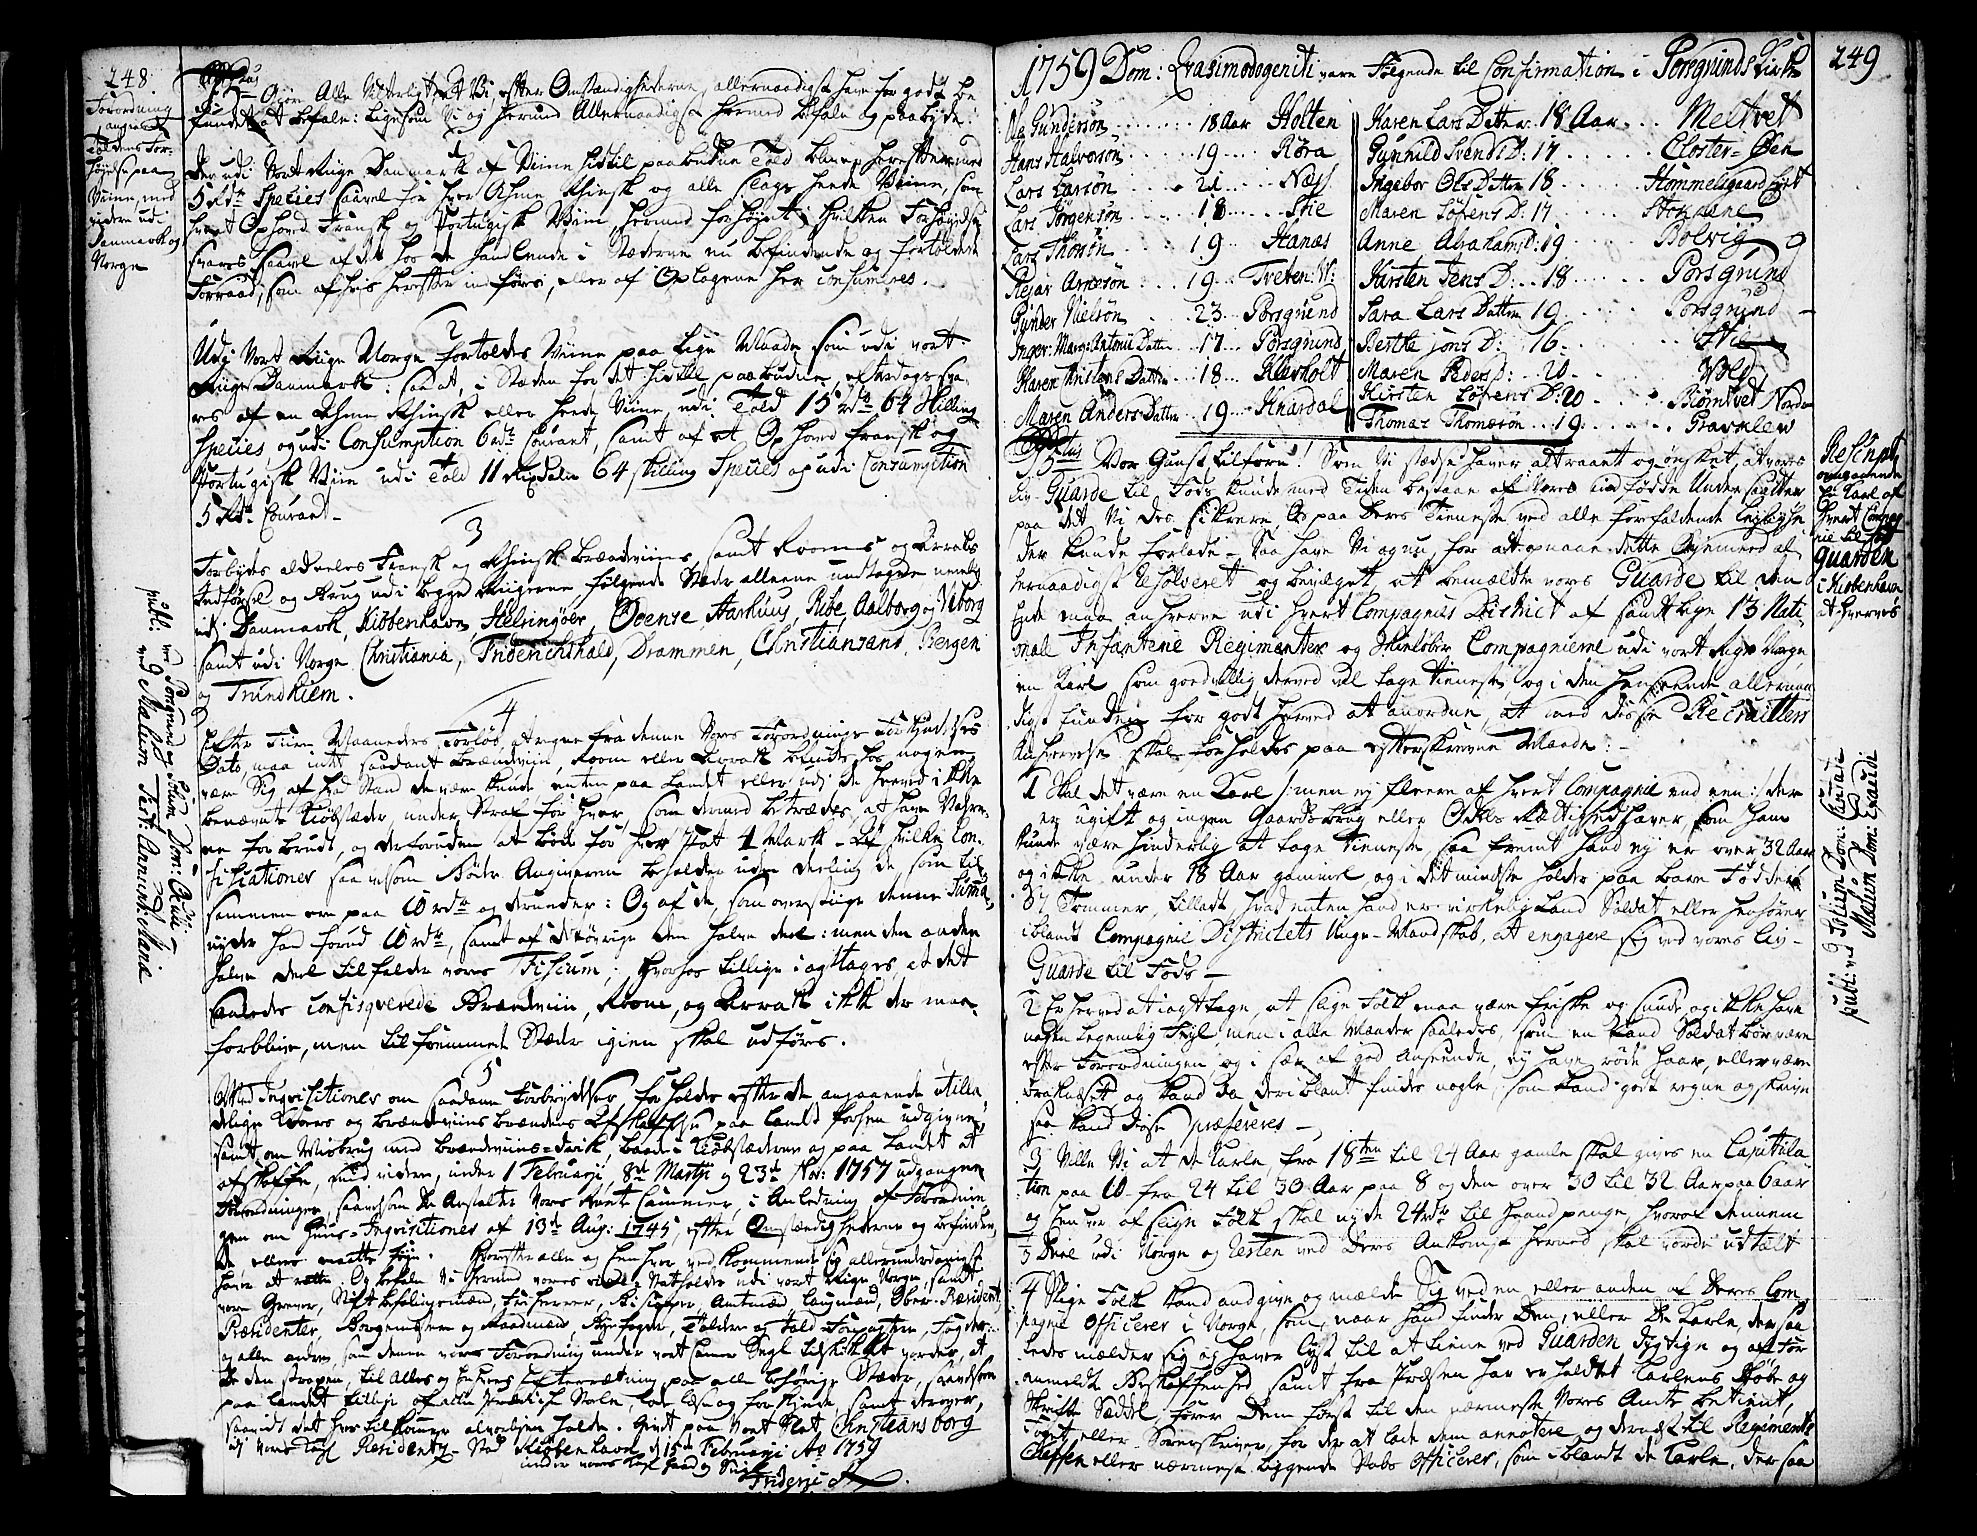 SAKO, Solum sokneprestkontor, A/Aa/L0002: Annen kirkebok nr. 2, 1743-1791, s. 248-249